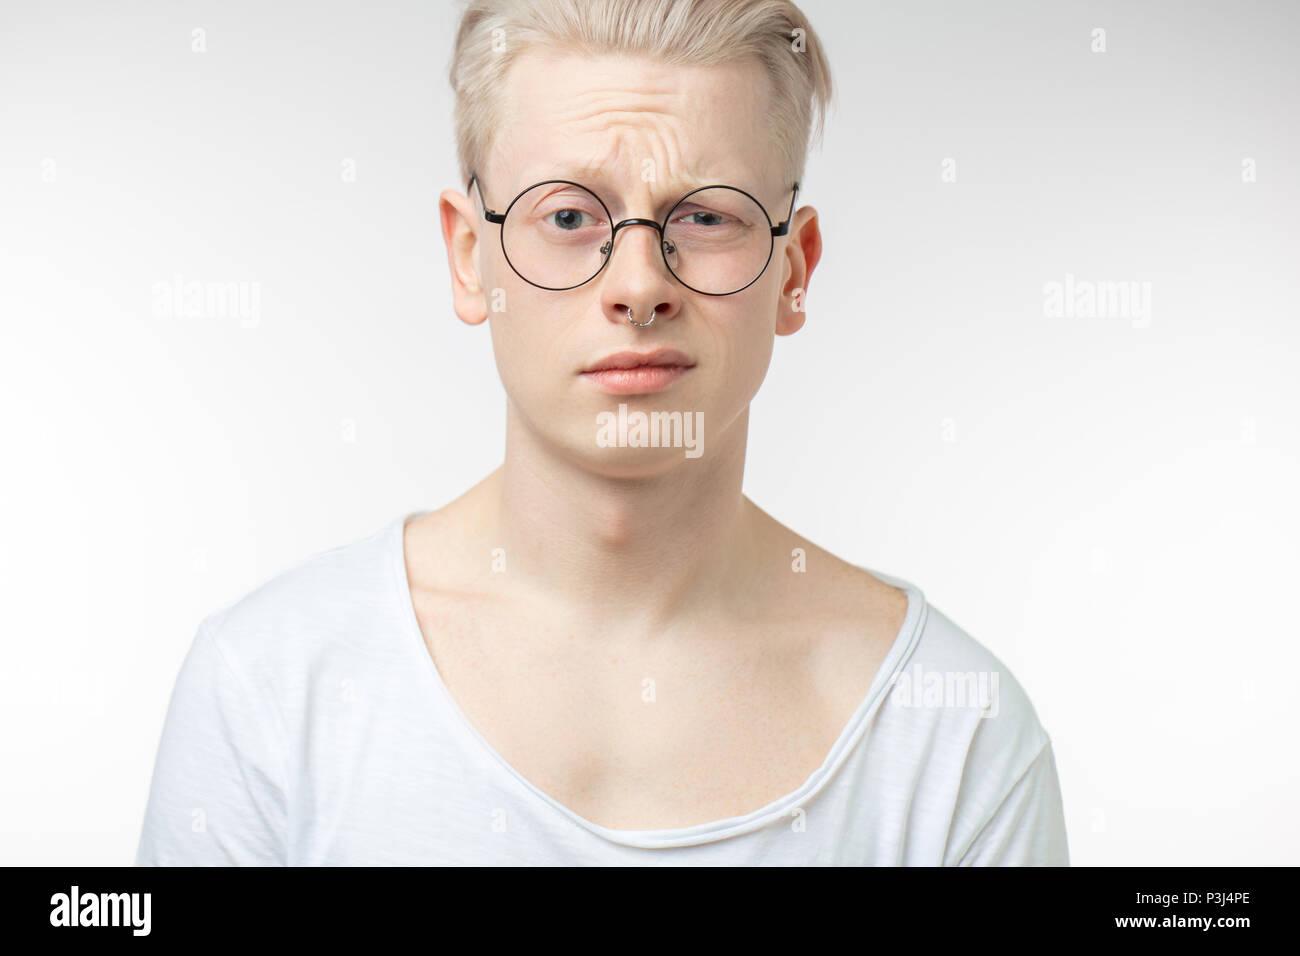 Duda, expresión y personas concepto - Hombre pensando sobre fondo gris Imagen De Stock